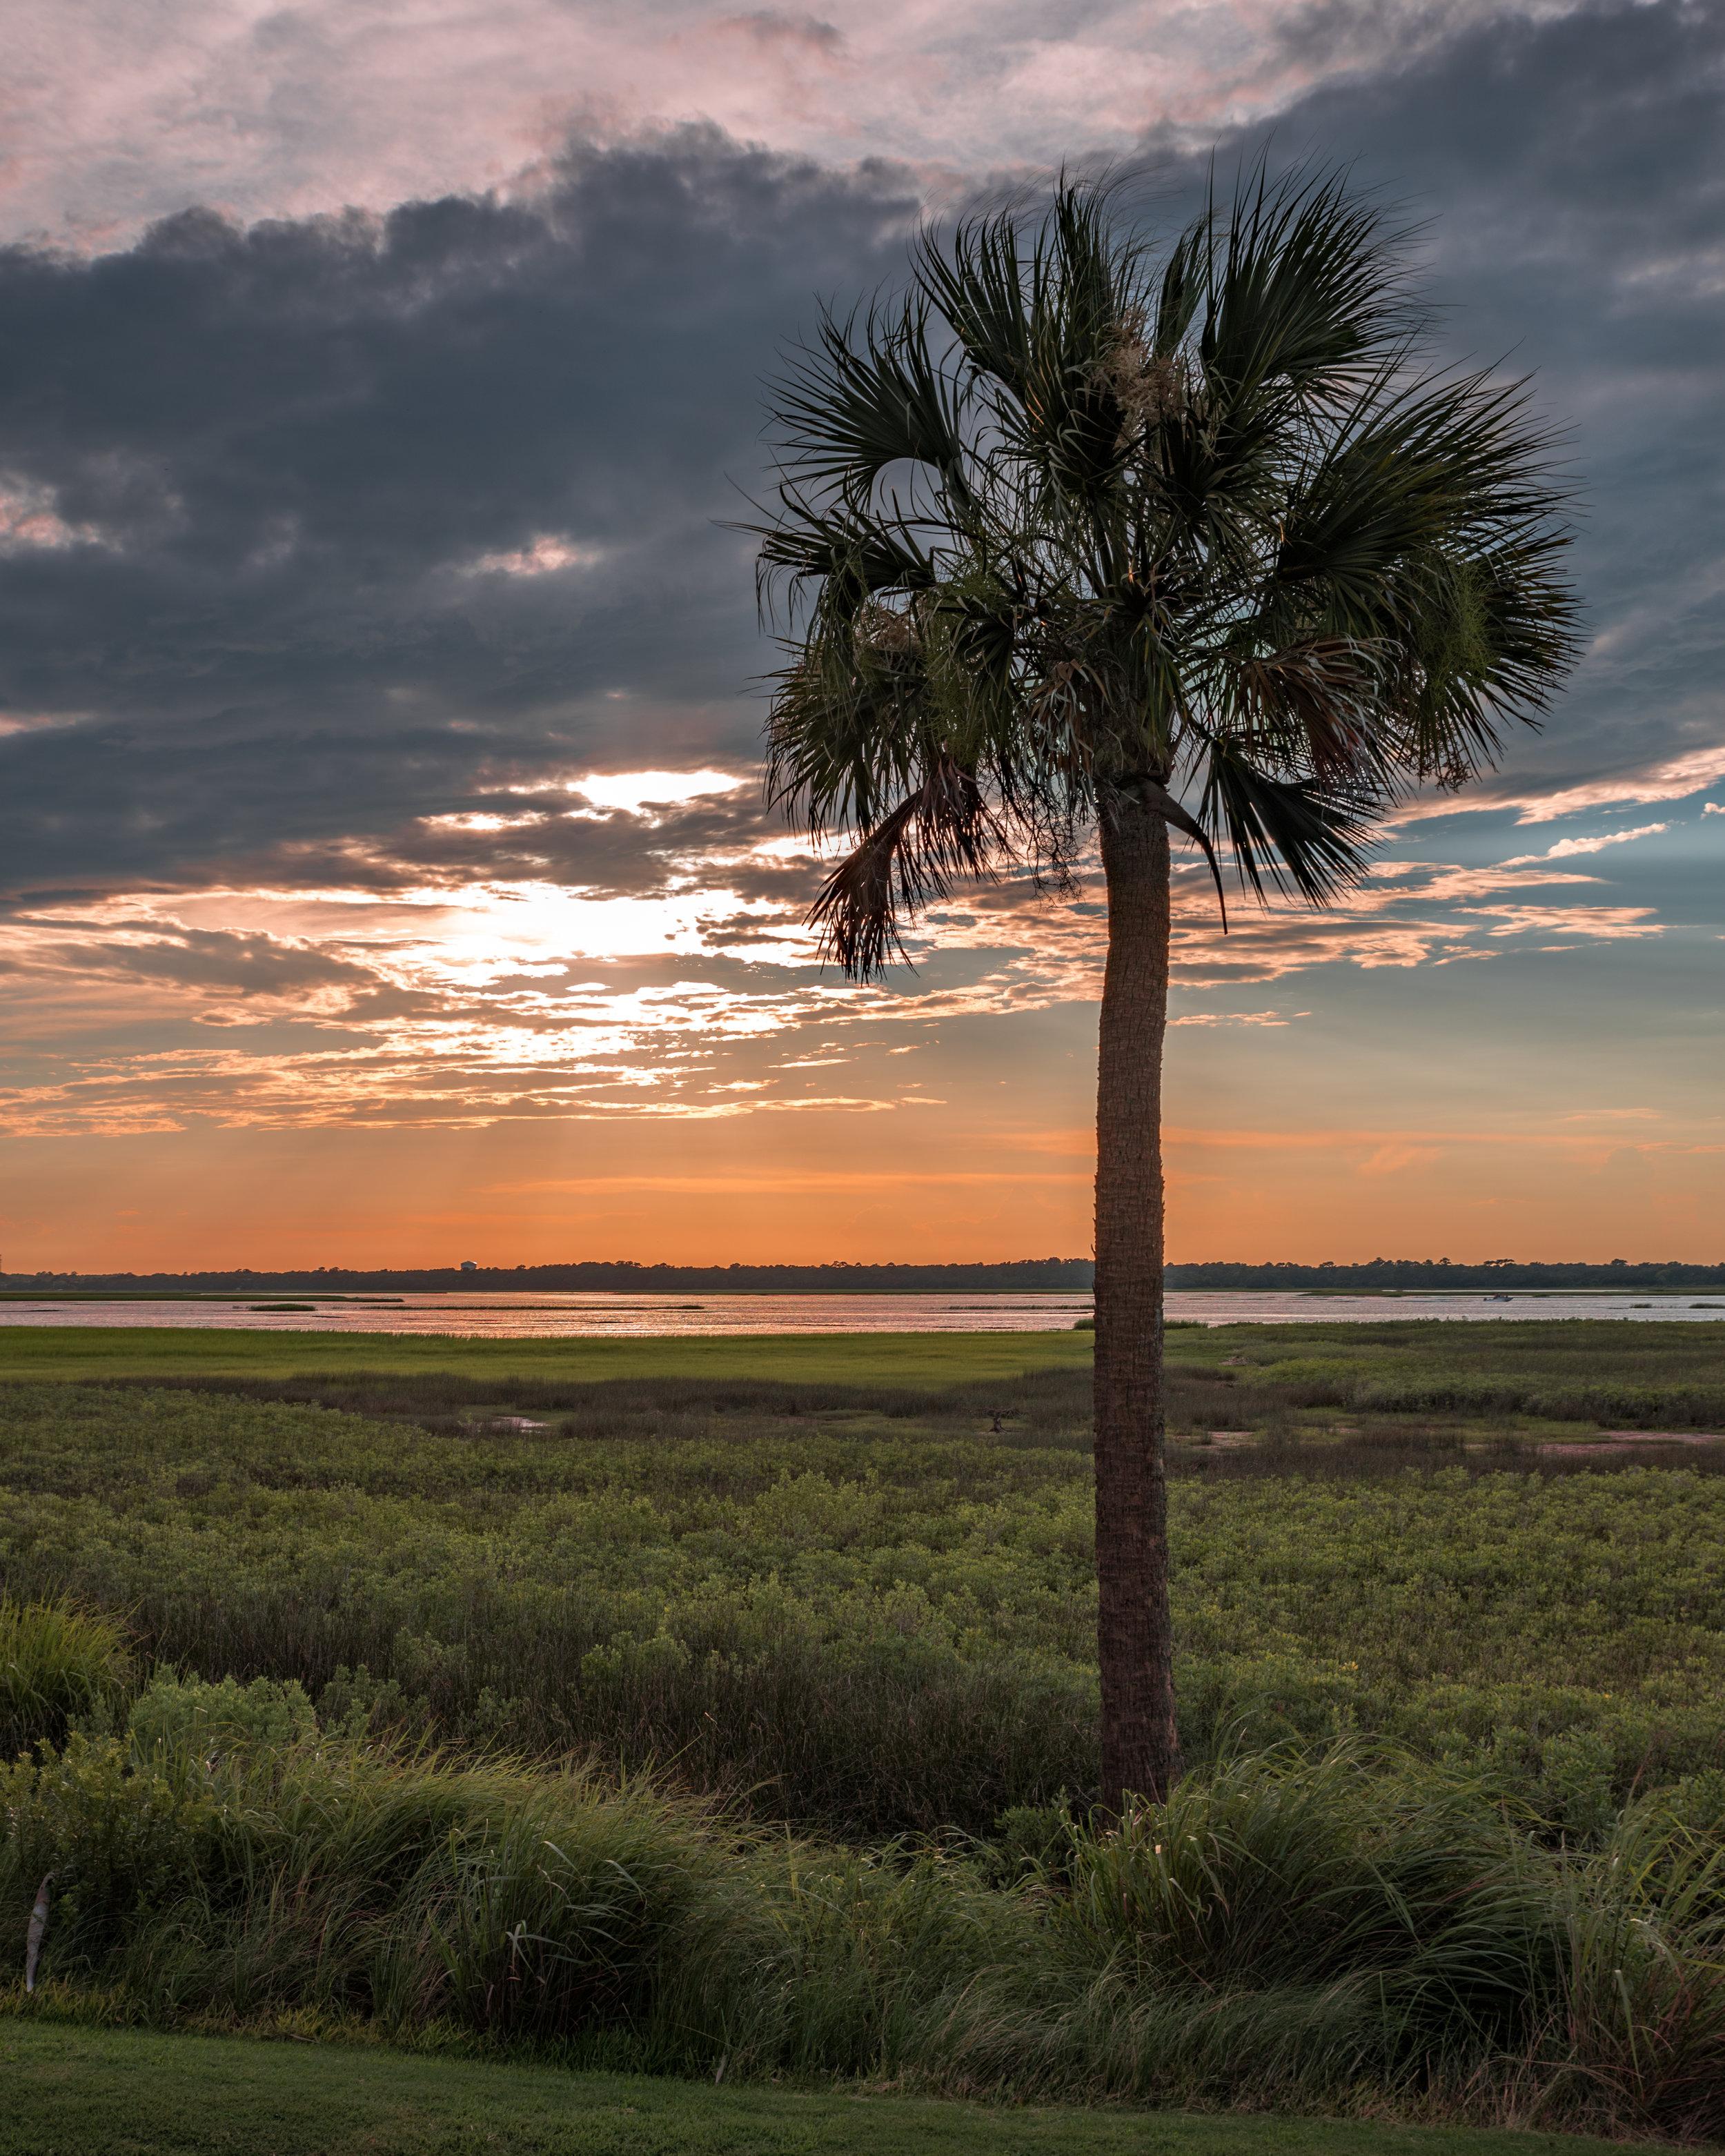 Golf Course Palm Tree Sunset.jpg